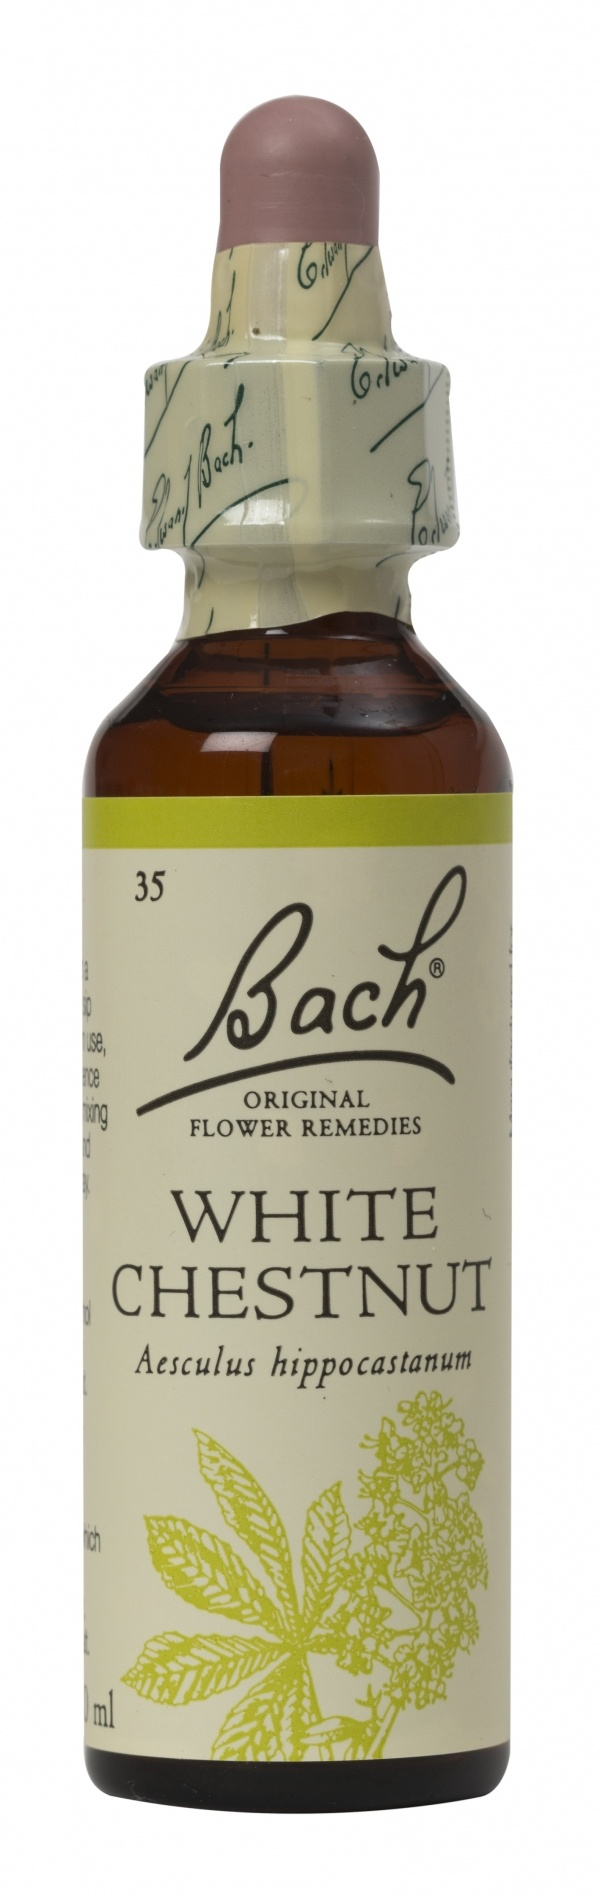 Bach Flower Remedy White Chestnut 20ml